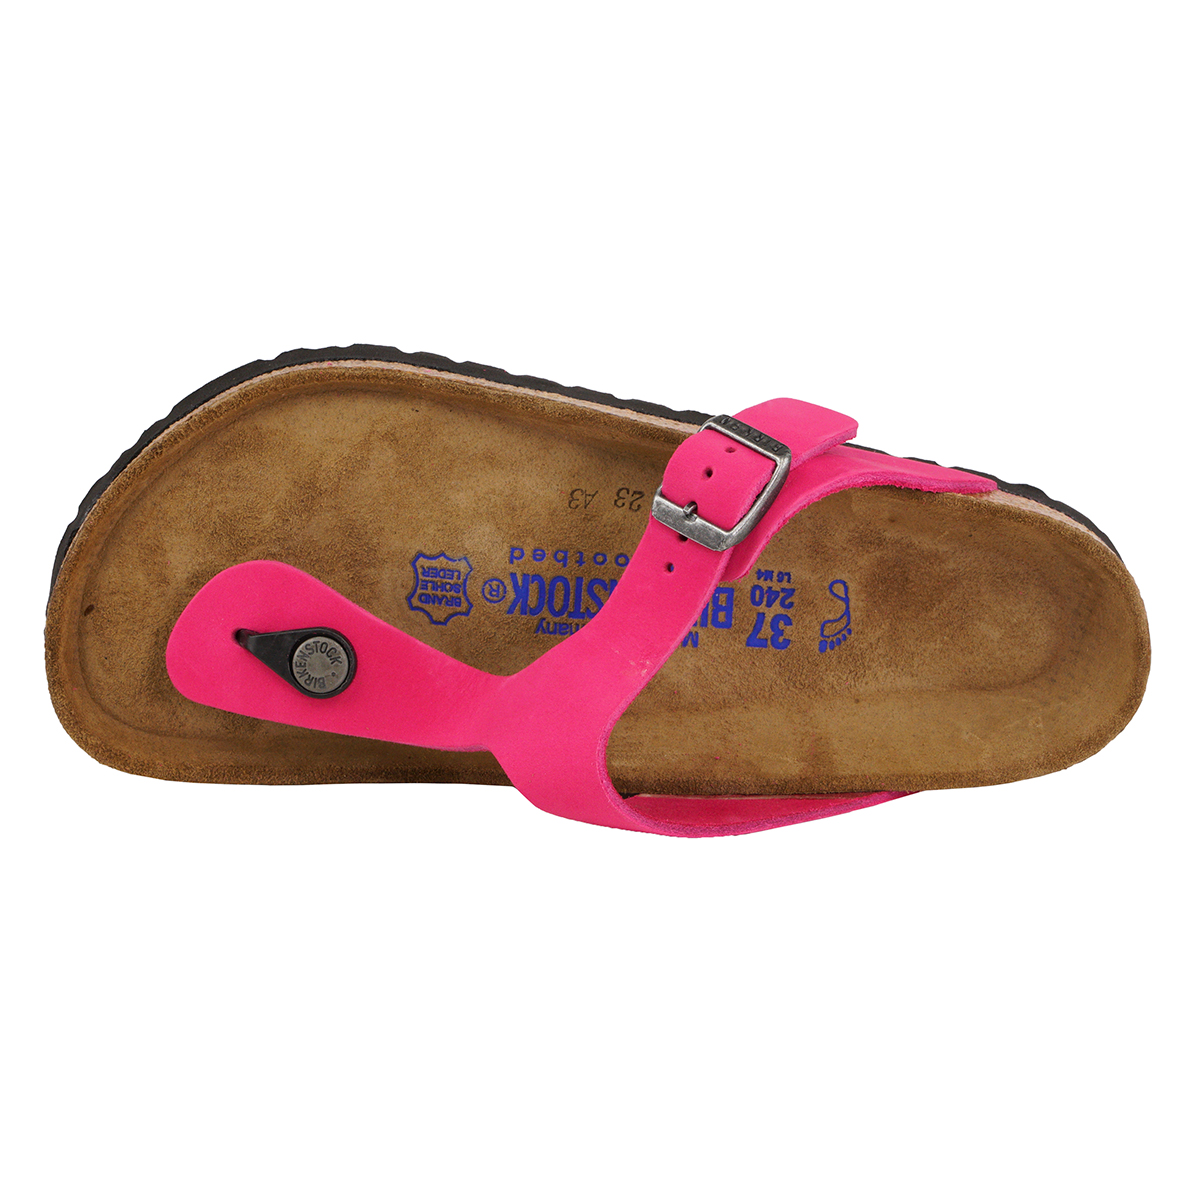 71eae6cc658 Birkenstock Gizeh Soft Footbed Leather Sandals Pink 38 N ...